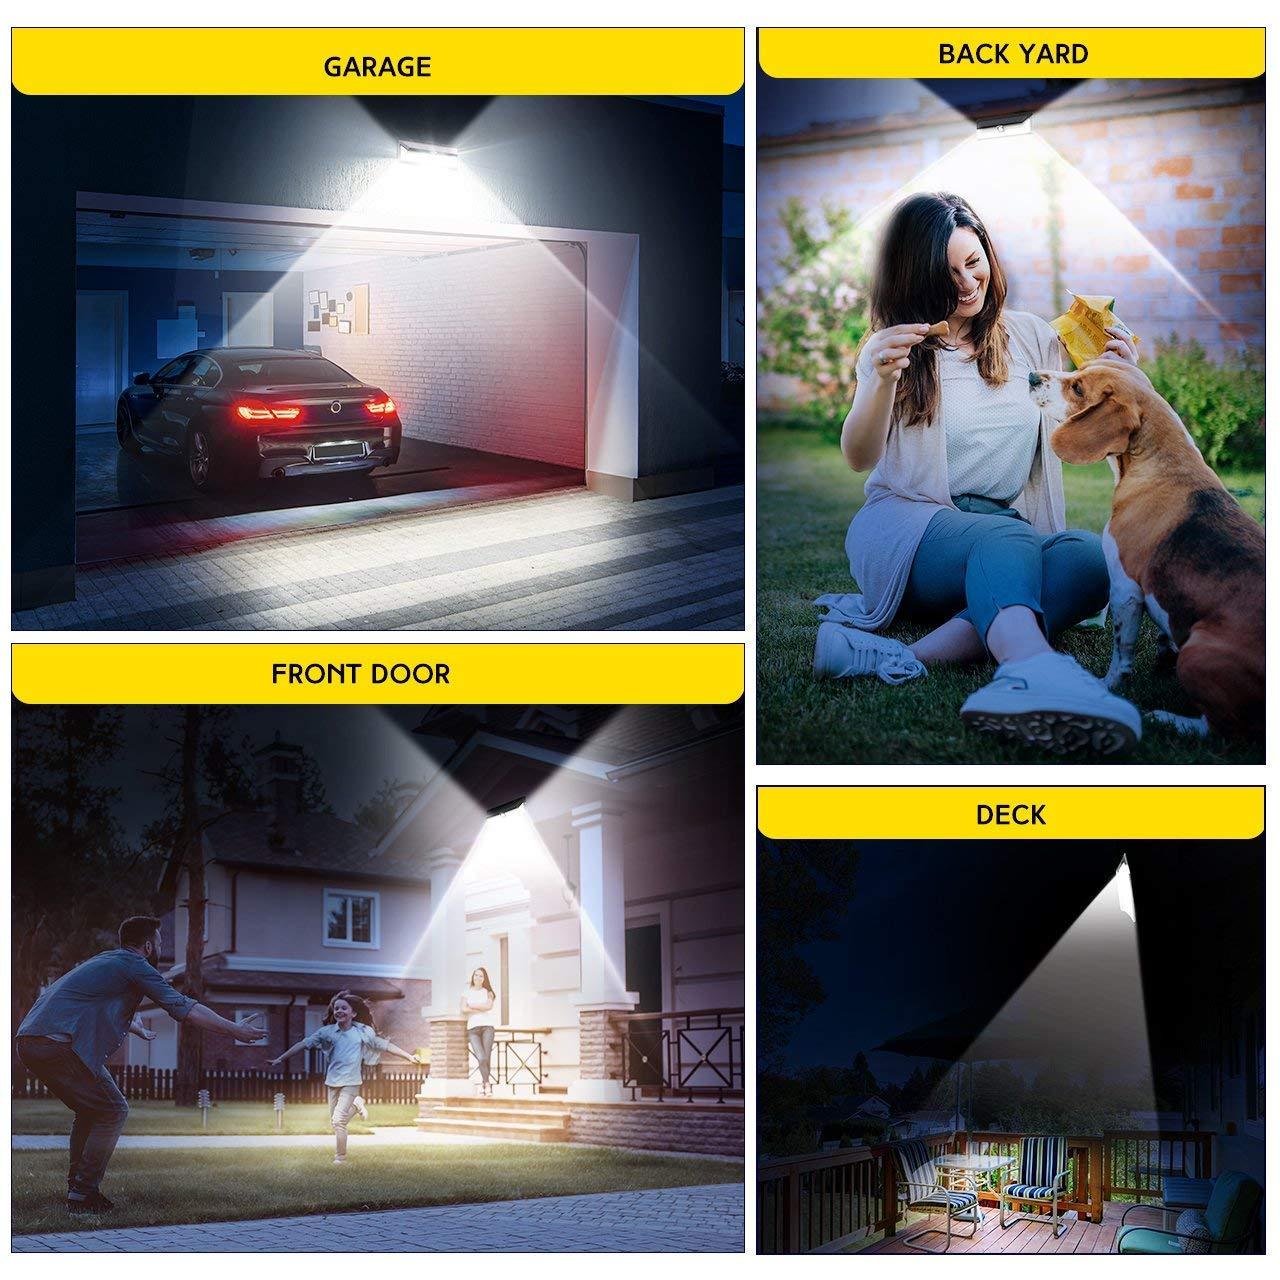 LITOM Solar Lights Outdoor 42 LED, Adjustable Lighting Time Solar Motion Sensor Light with 270° Wide Angle and Waterproof Design, Wireless Solar Lighting for Front Door, Yard, Garage, Deck (2 Pack) by Litom (Image #7)